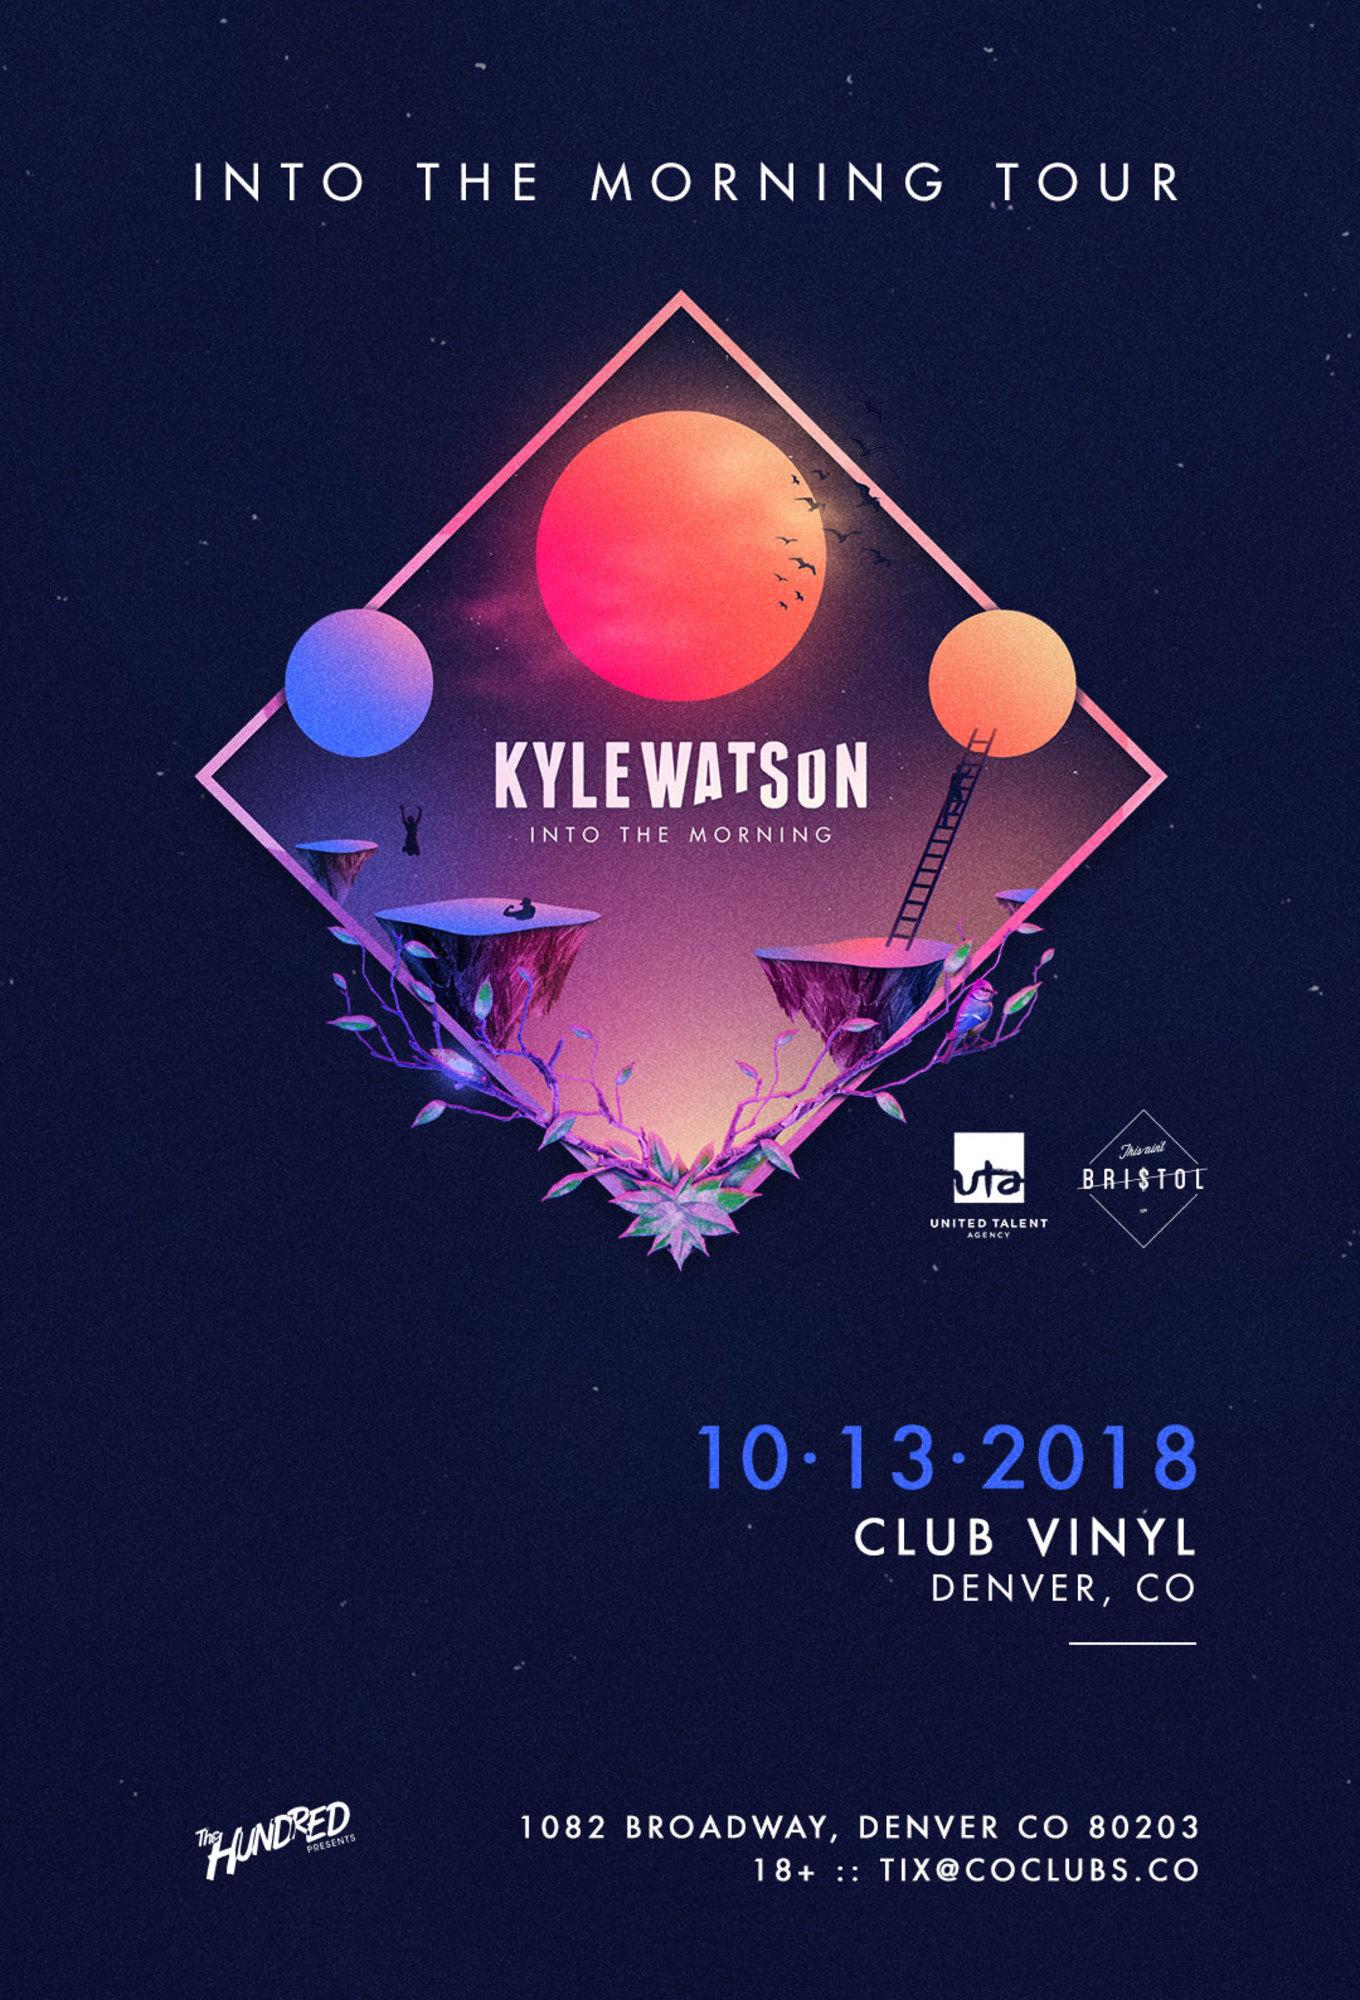 Club vinyl denver dress code